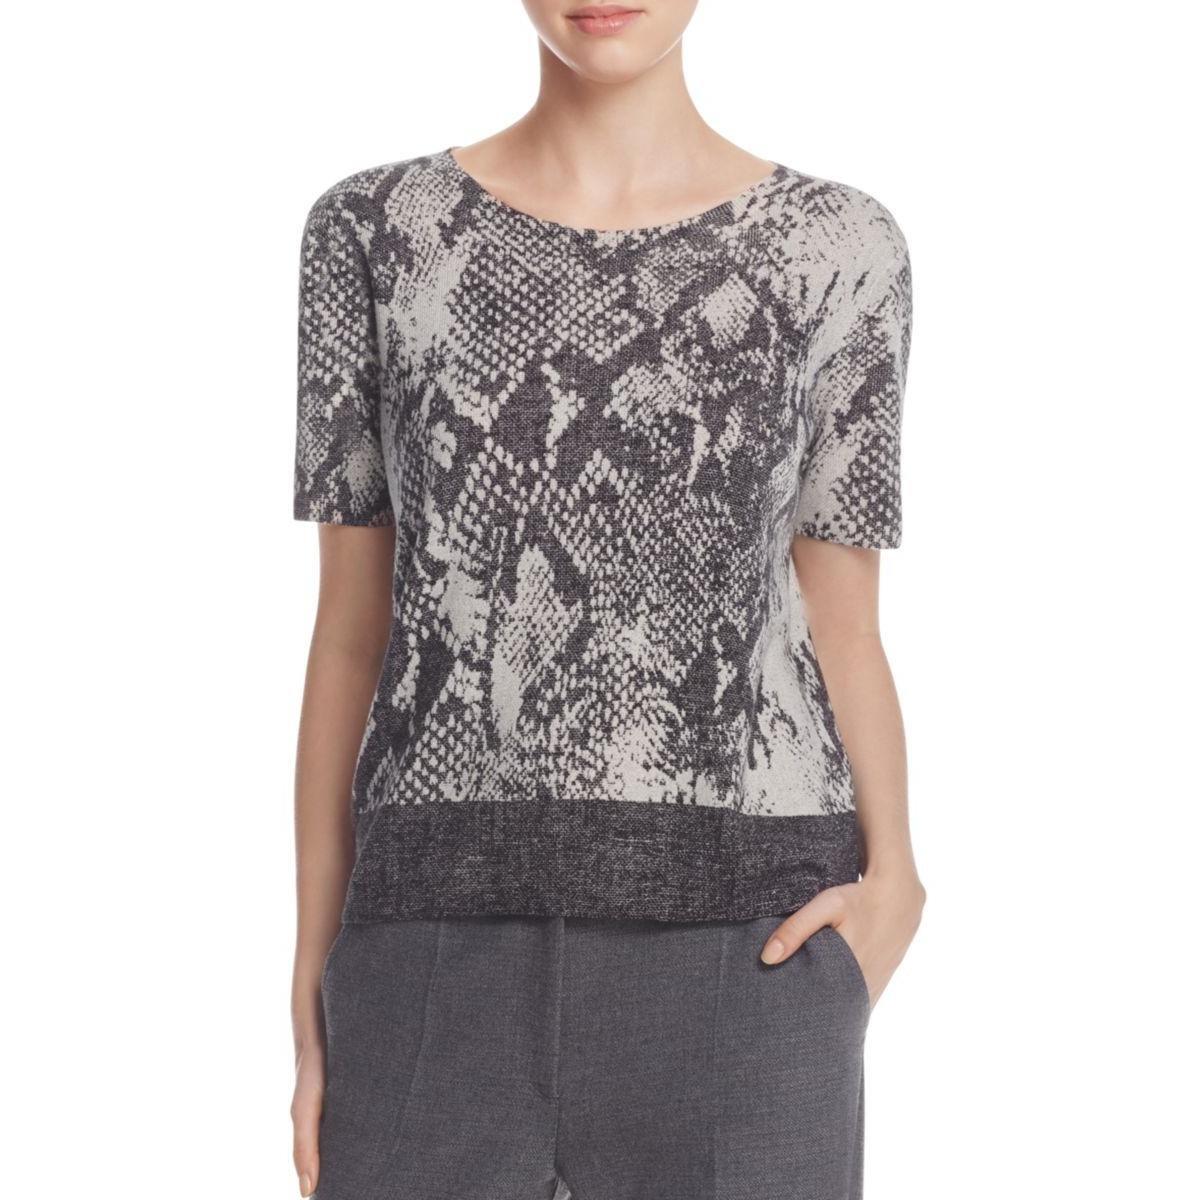 BOSS Hugo Boss Womens Wool Printed Casual Top Gray XL by HUGO BOSS